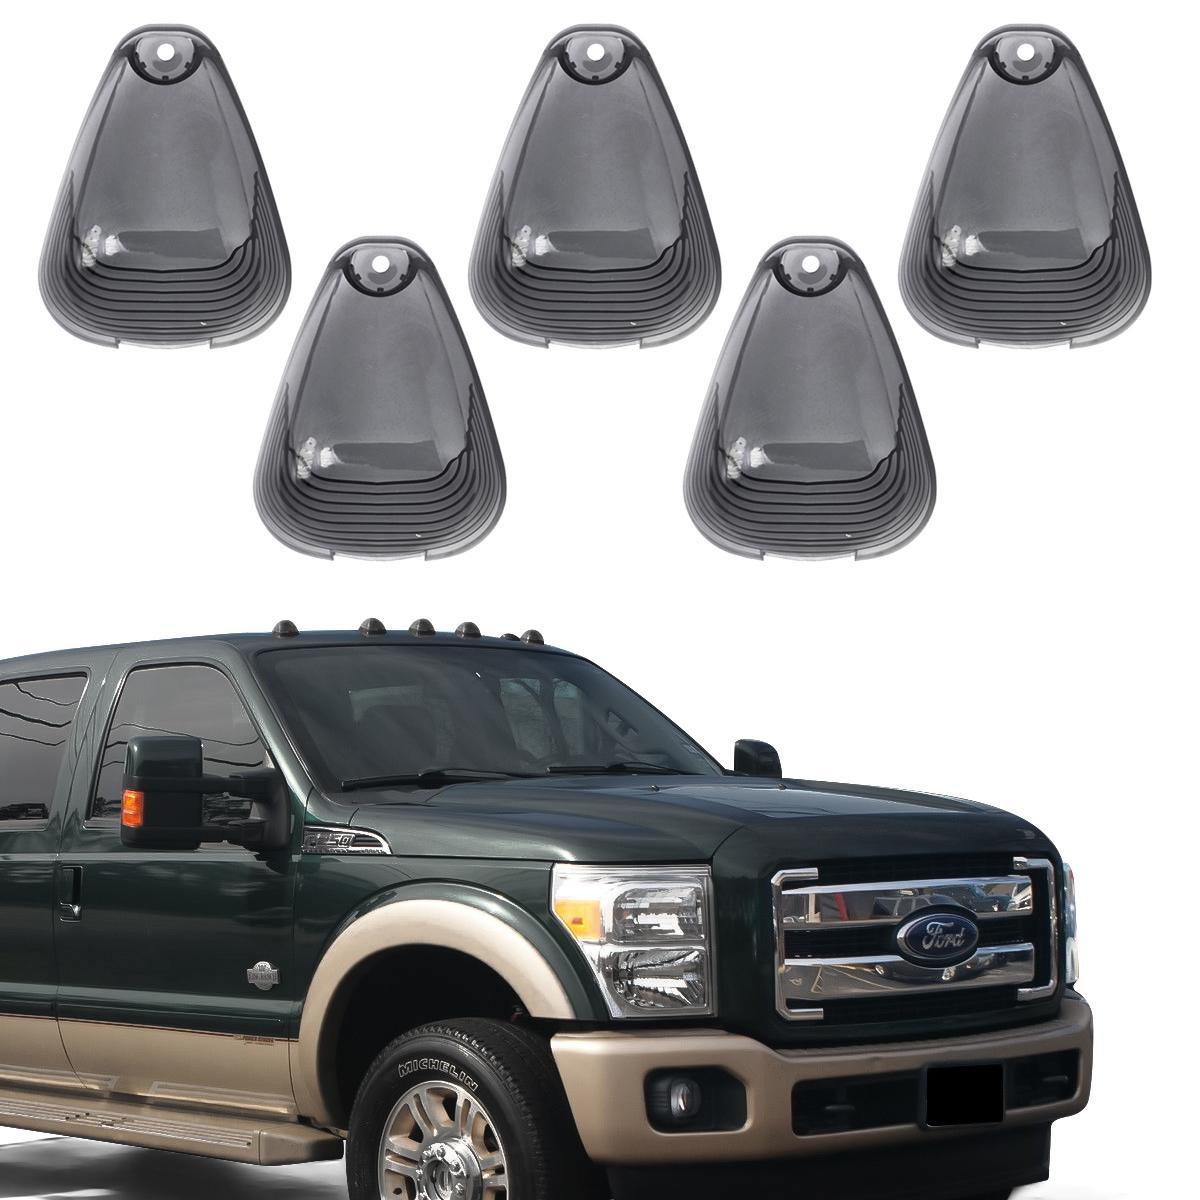 5 Smoke Cab Roof Running Marker Light Cover Lens For Ford